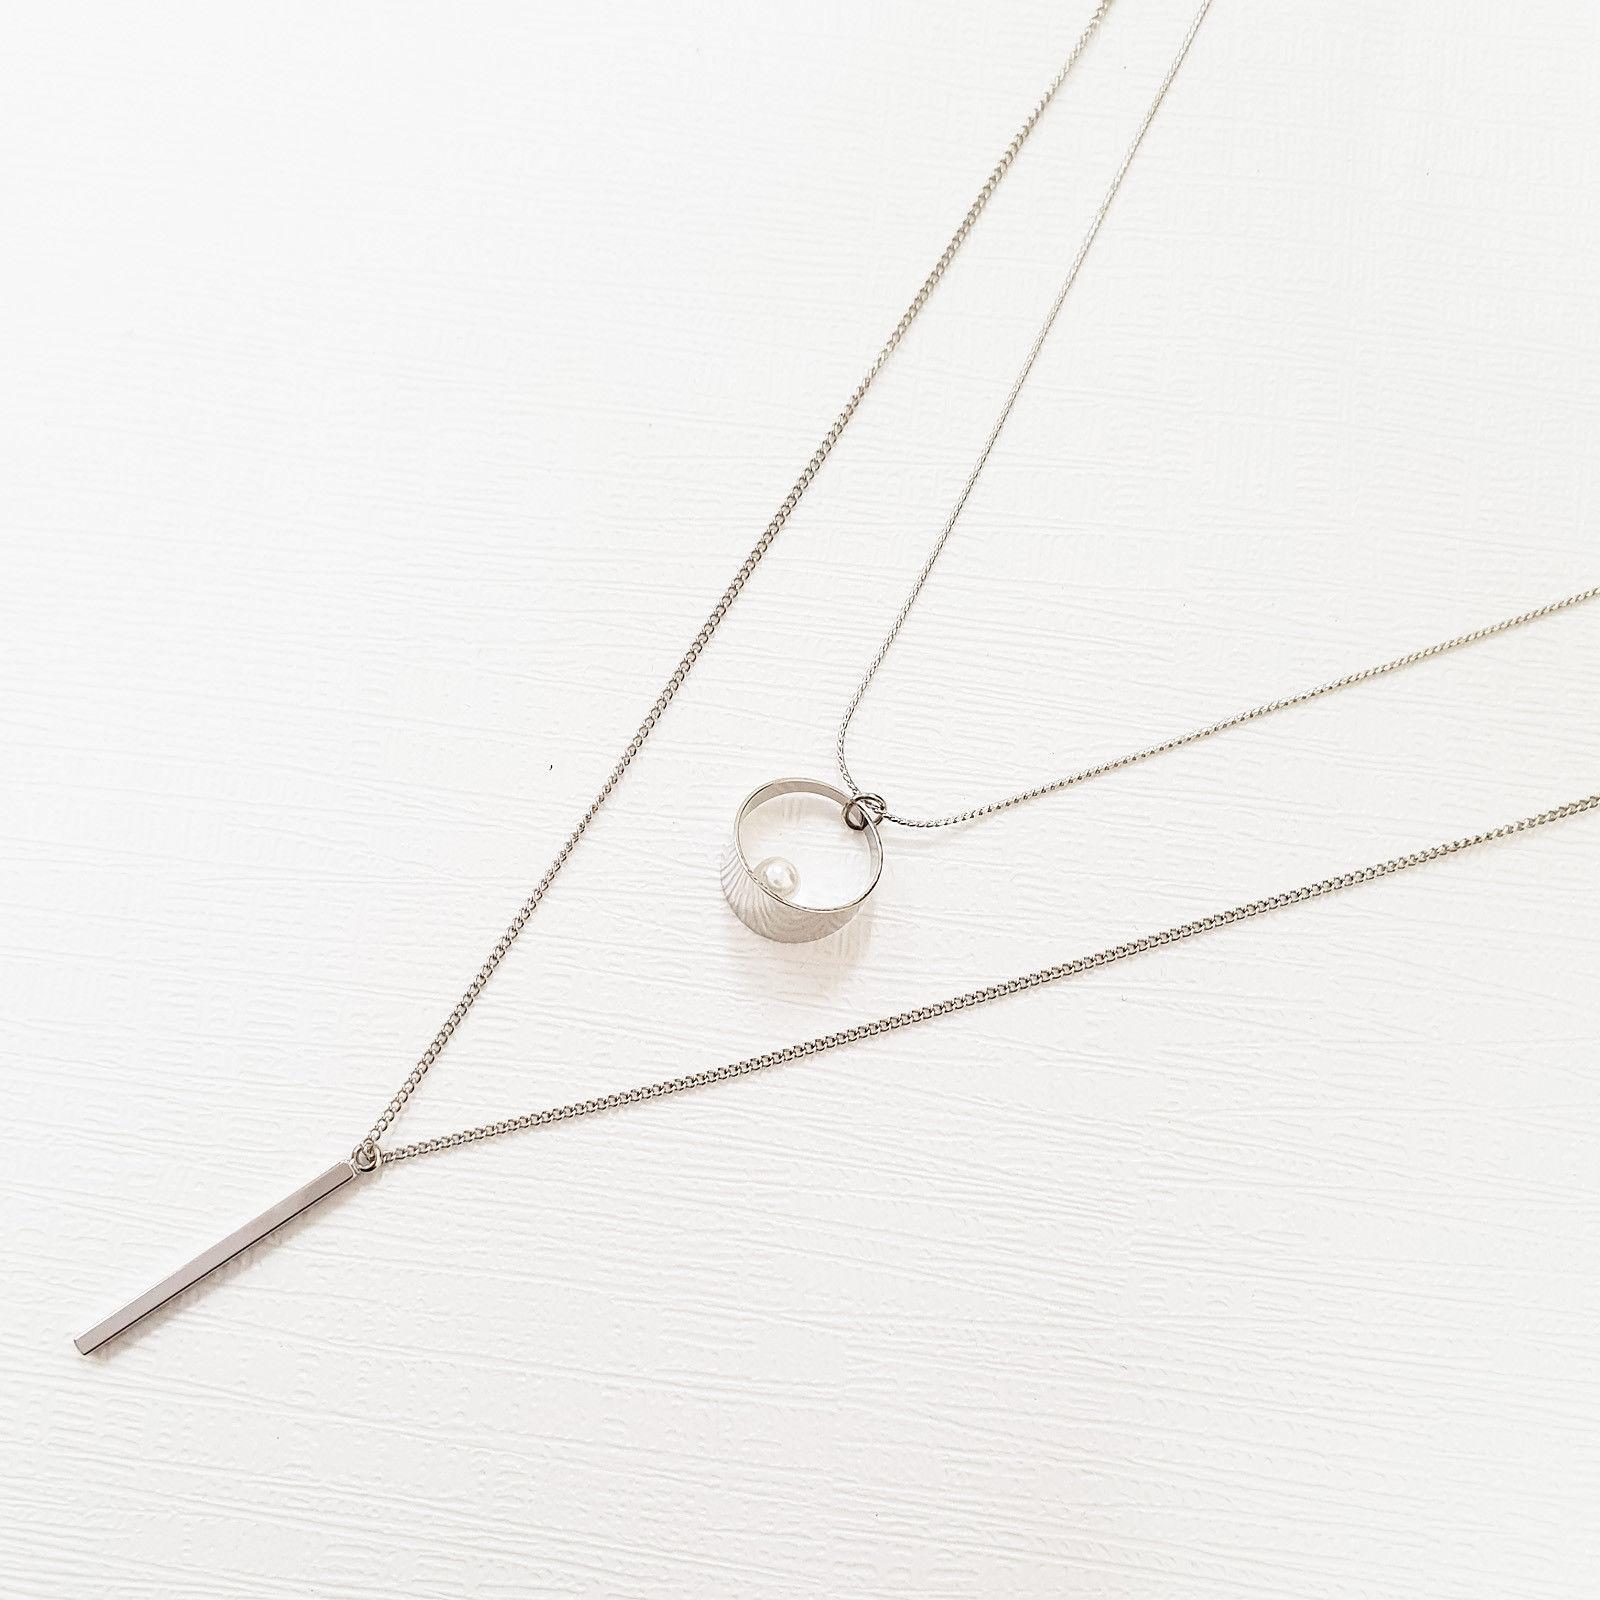 Multi-Strand Bar Open Circle Princess Layered Necklace Imitation Pearl N17